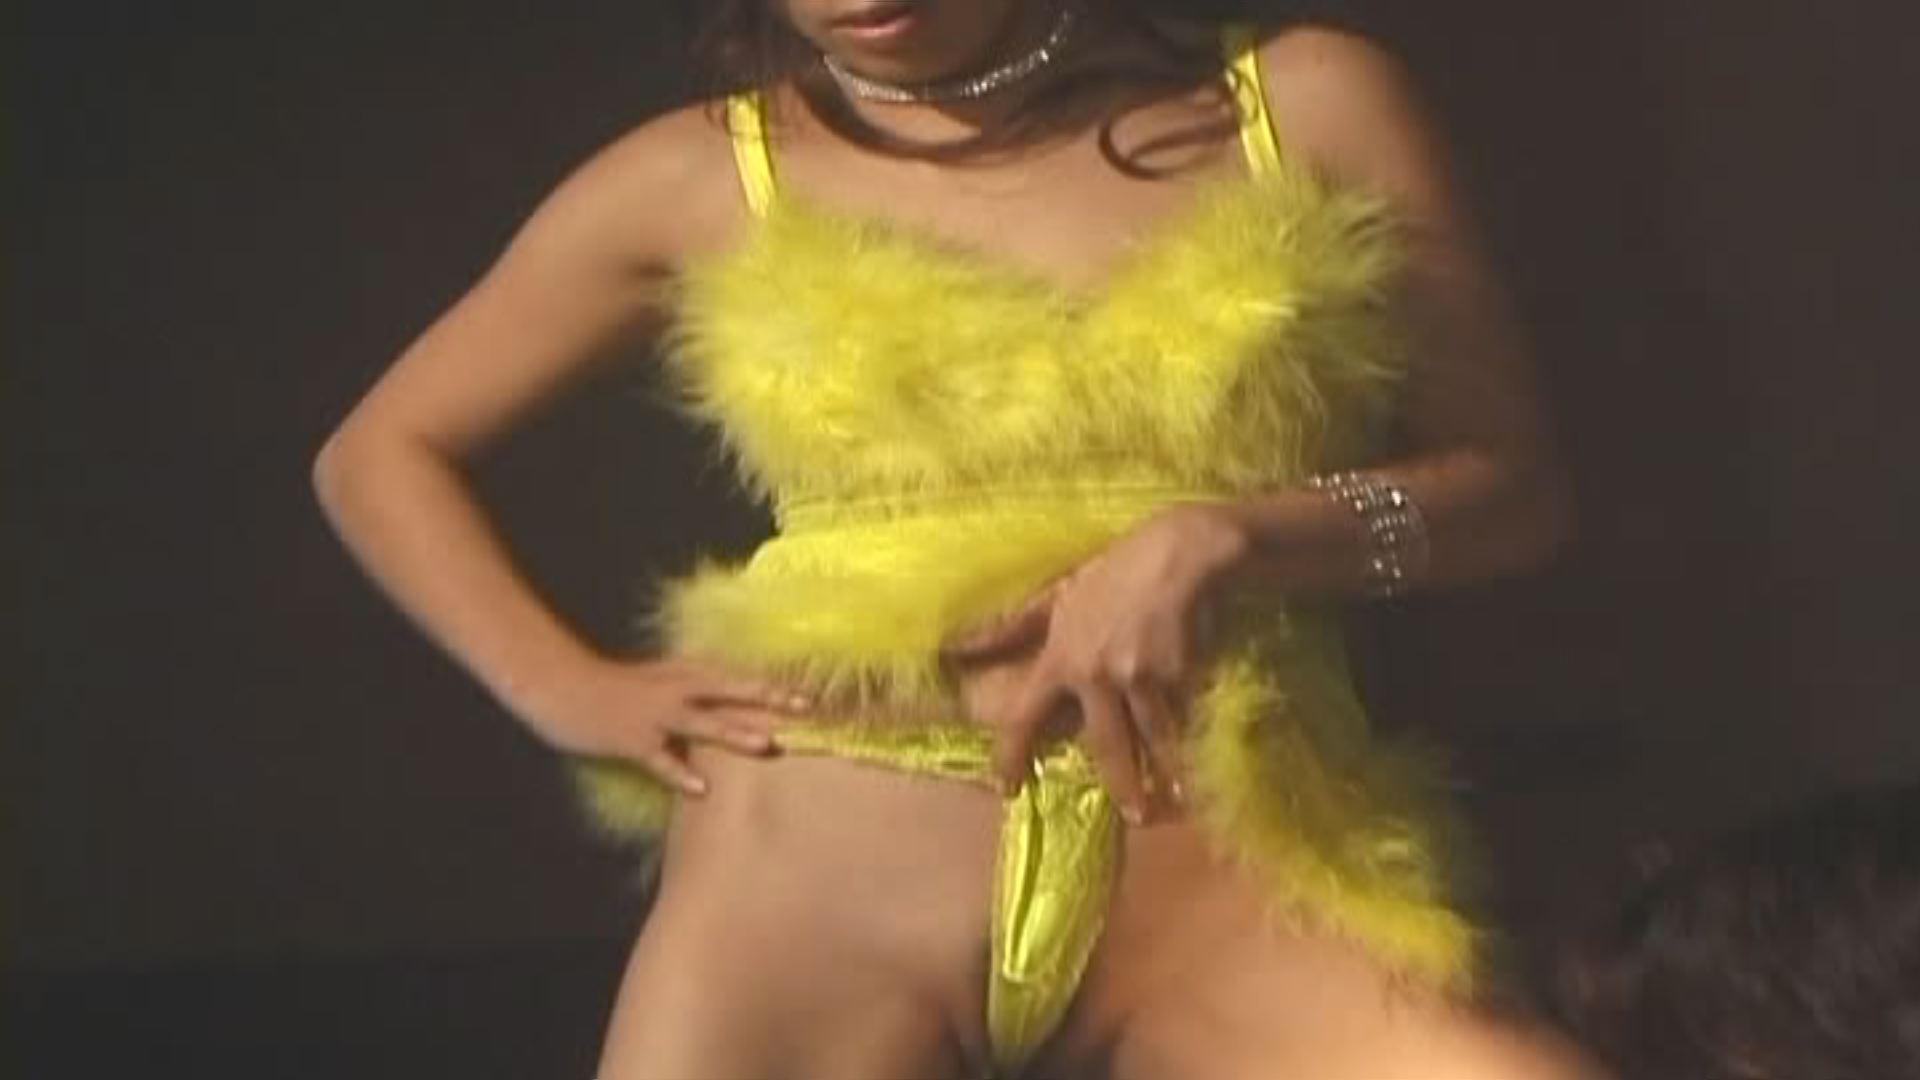 【HD動画】美巨乳スタイル抜群モ○ルが透け透けコスでエロエロダンス!くねくねする腰使いお尻を超接写w